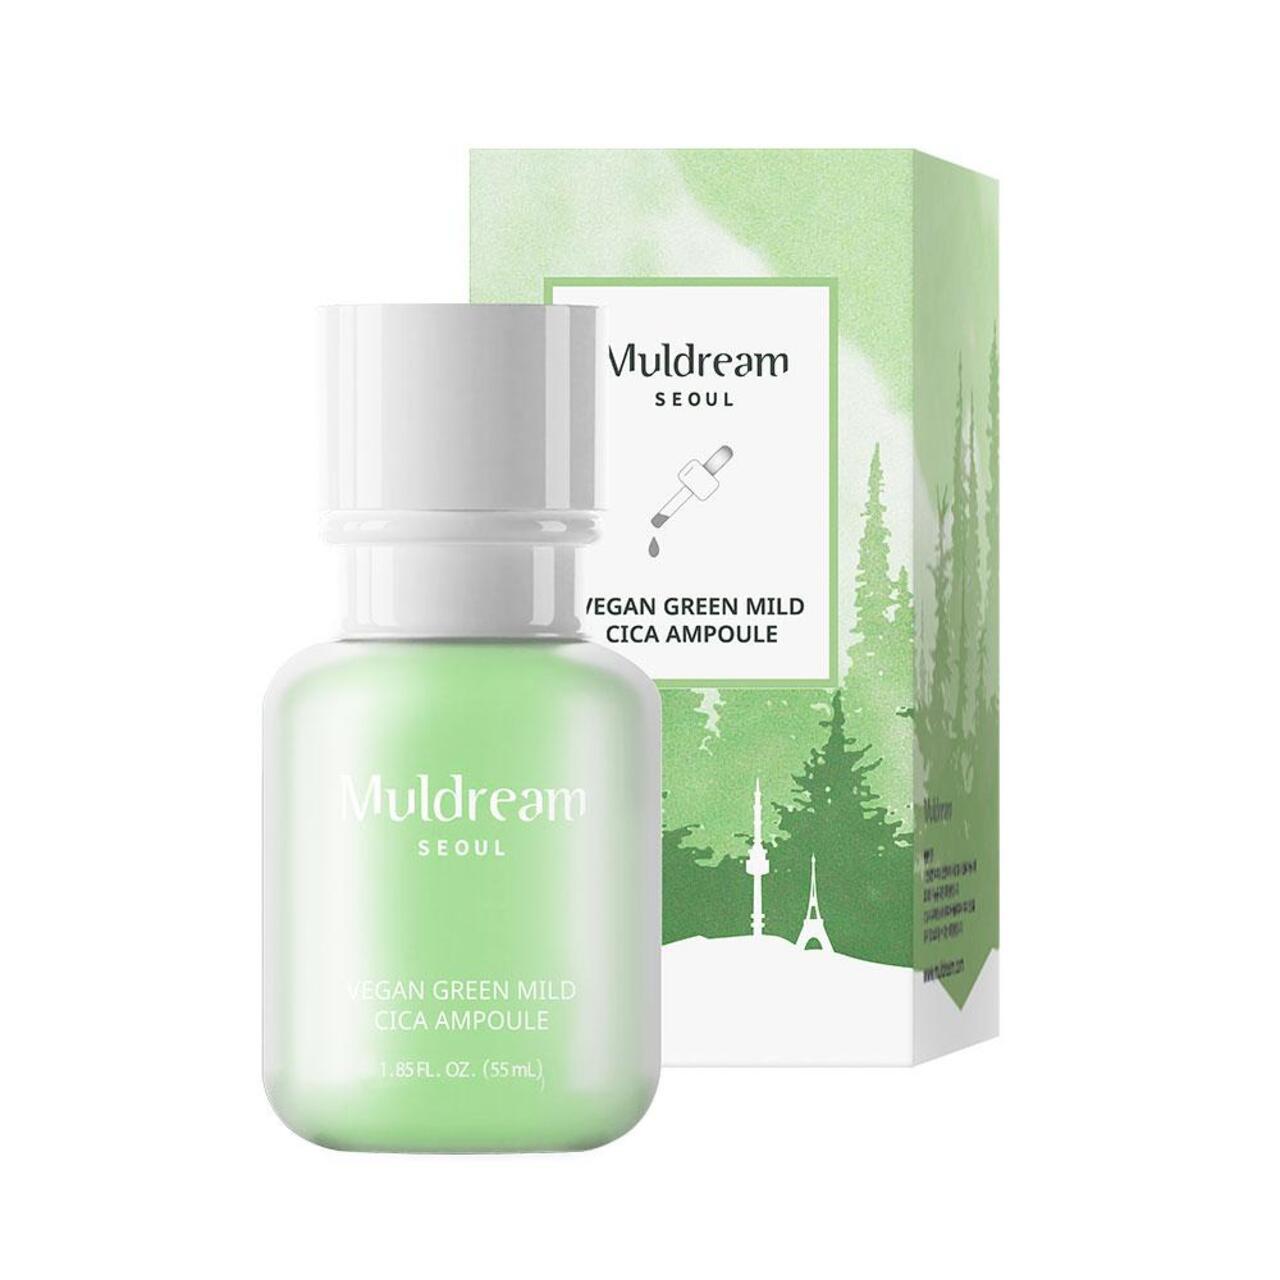 MULDREAM Vegan Green Mild Cica Ampoule, 60ml